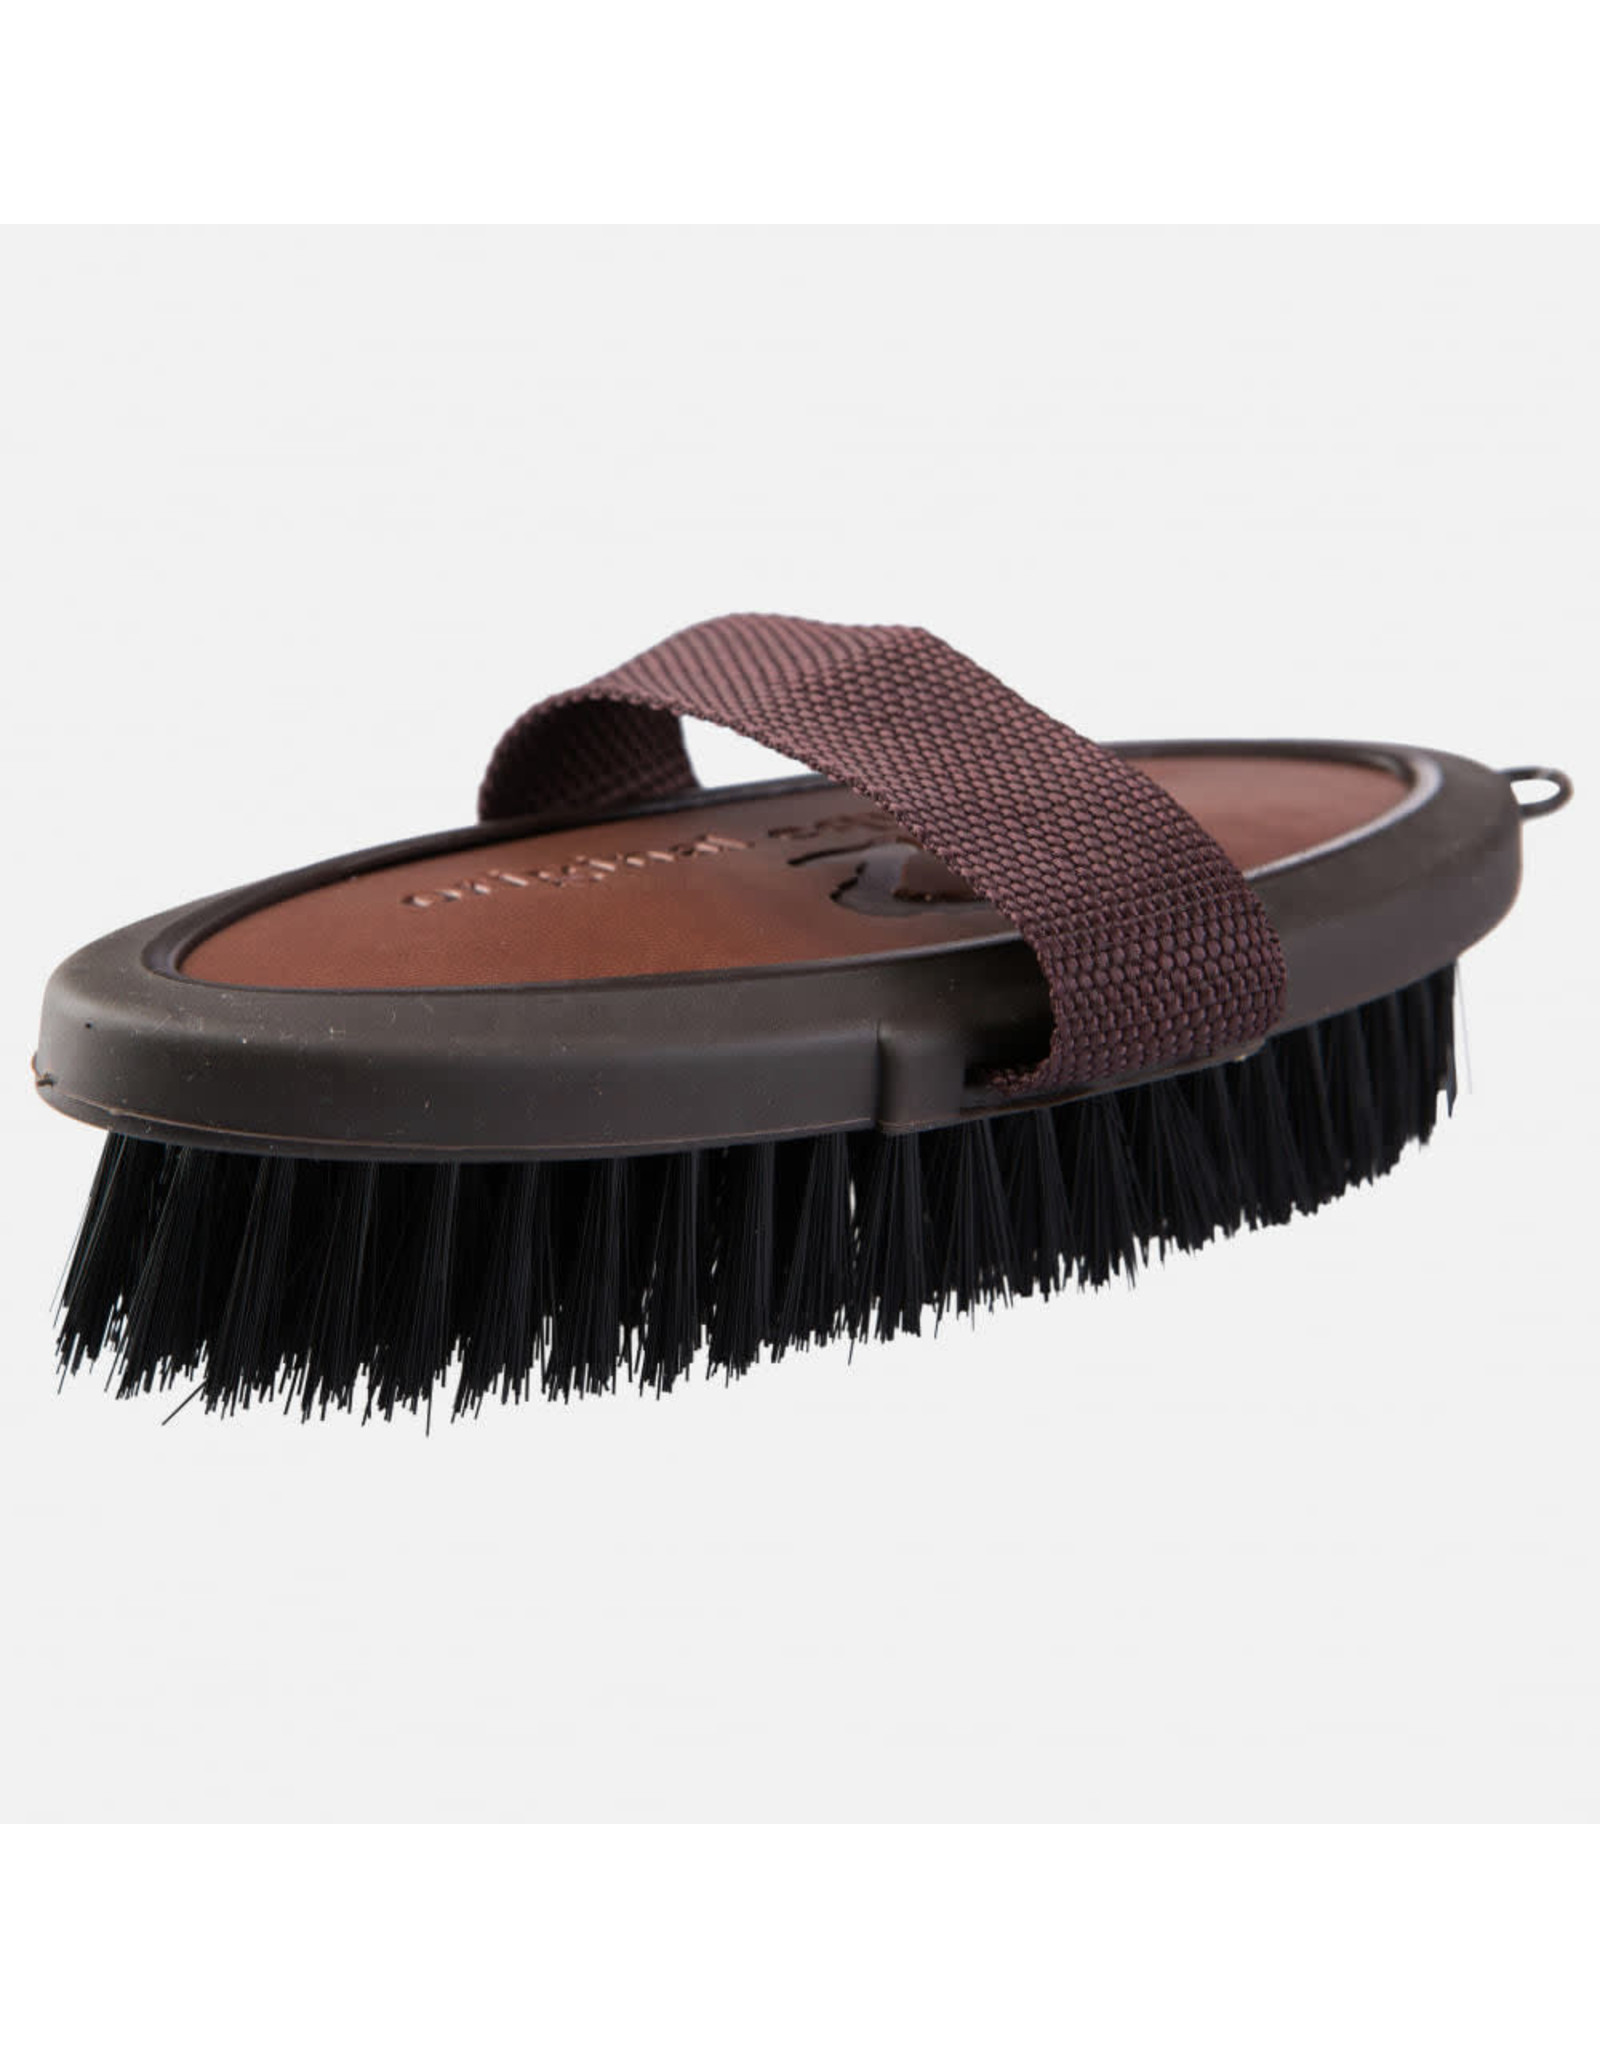 Horze Brush Maddox Vegan Leather Body